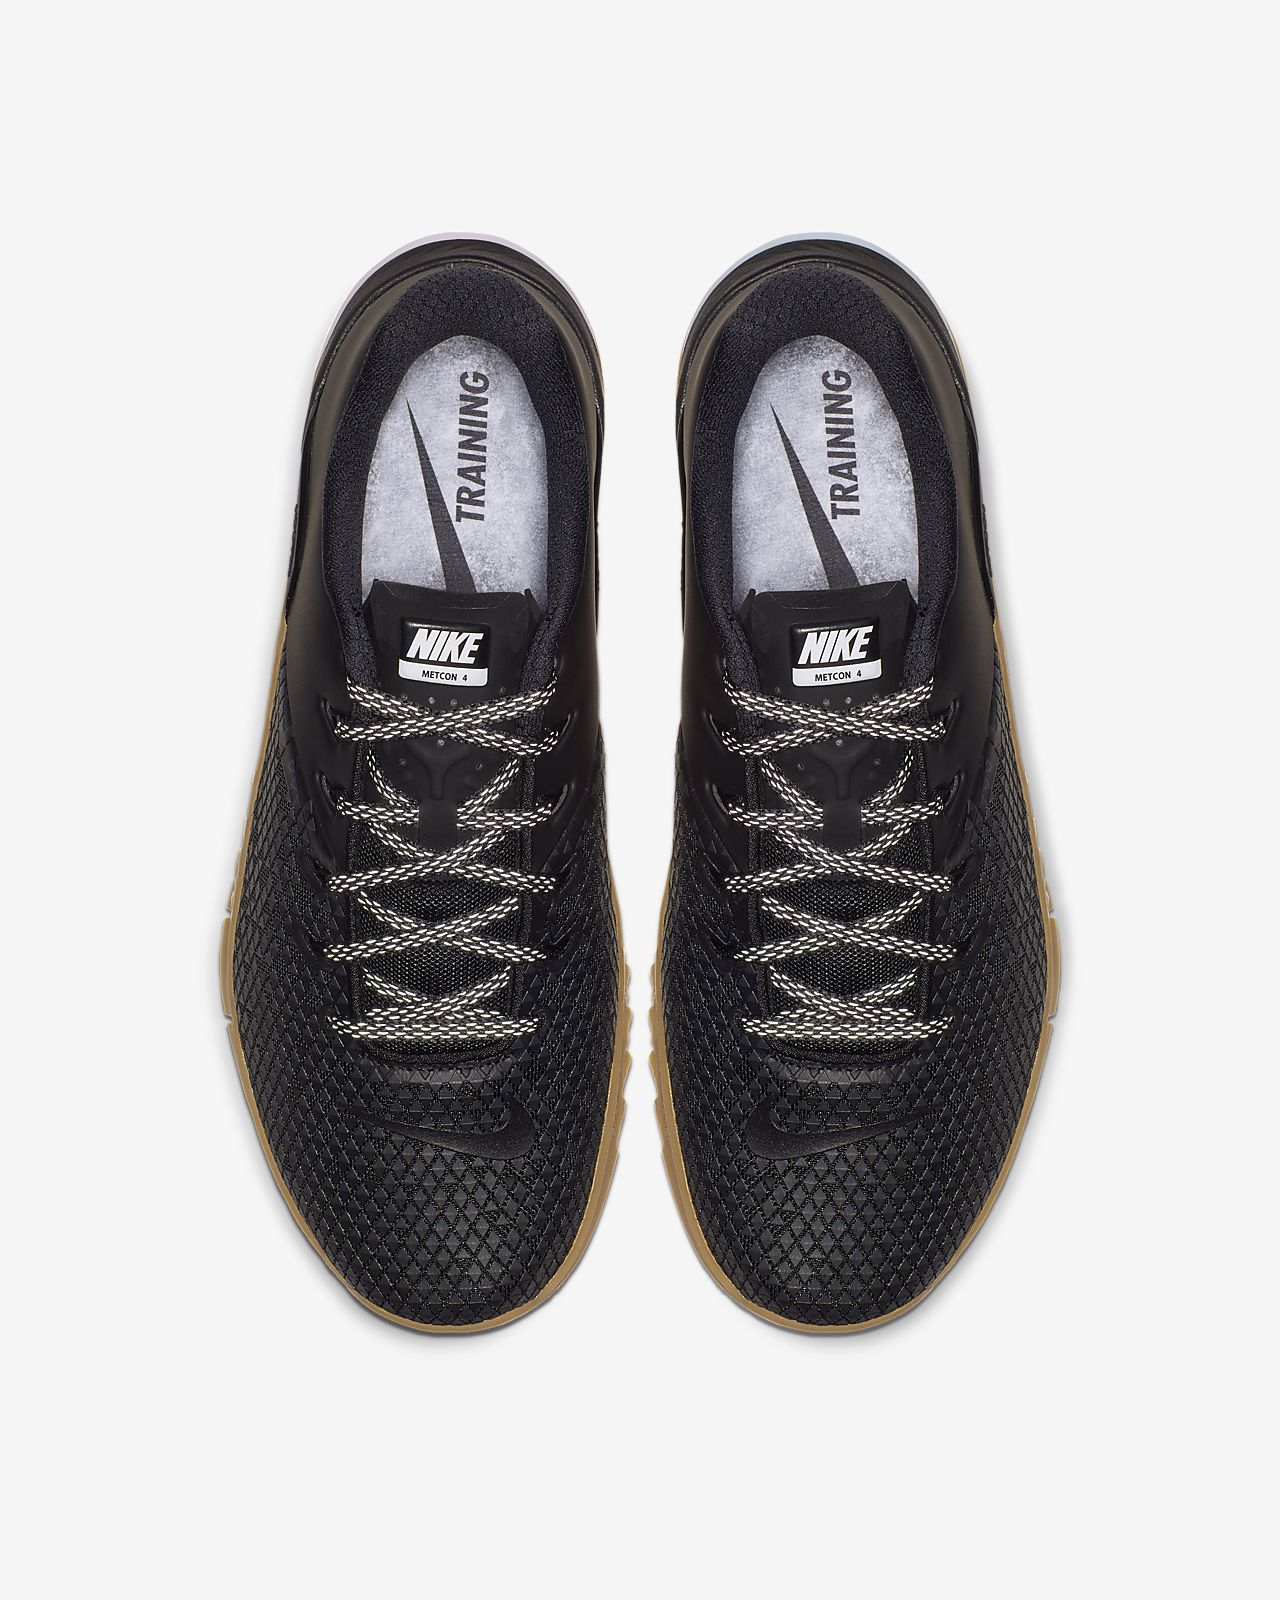 7bc8b1d73e932 ... Nike Metcon 4 XD X Chalkboard Men s Cross-Training Weightlifting Shoe